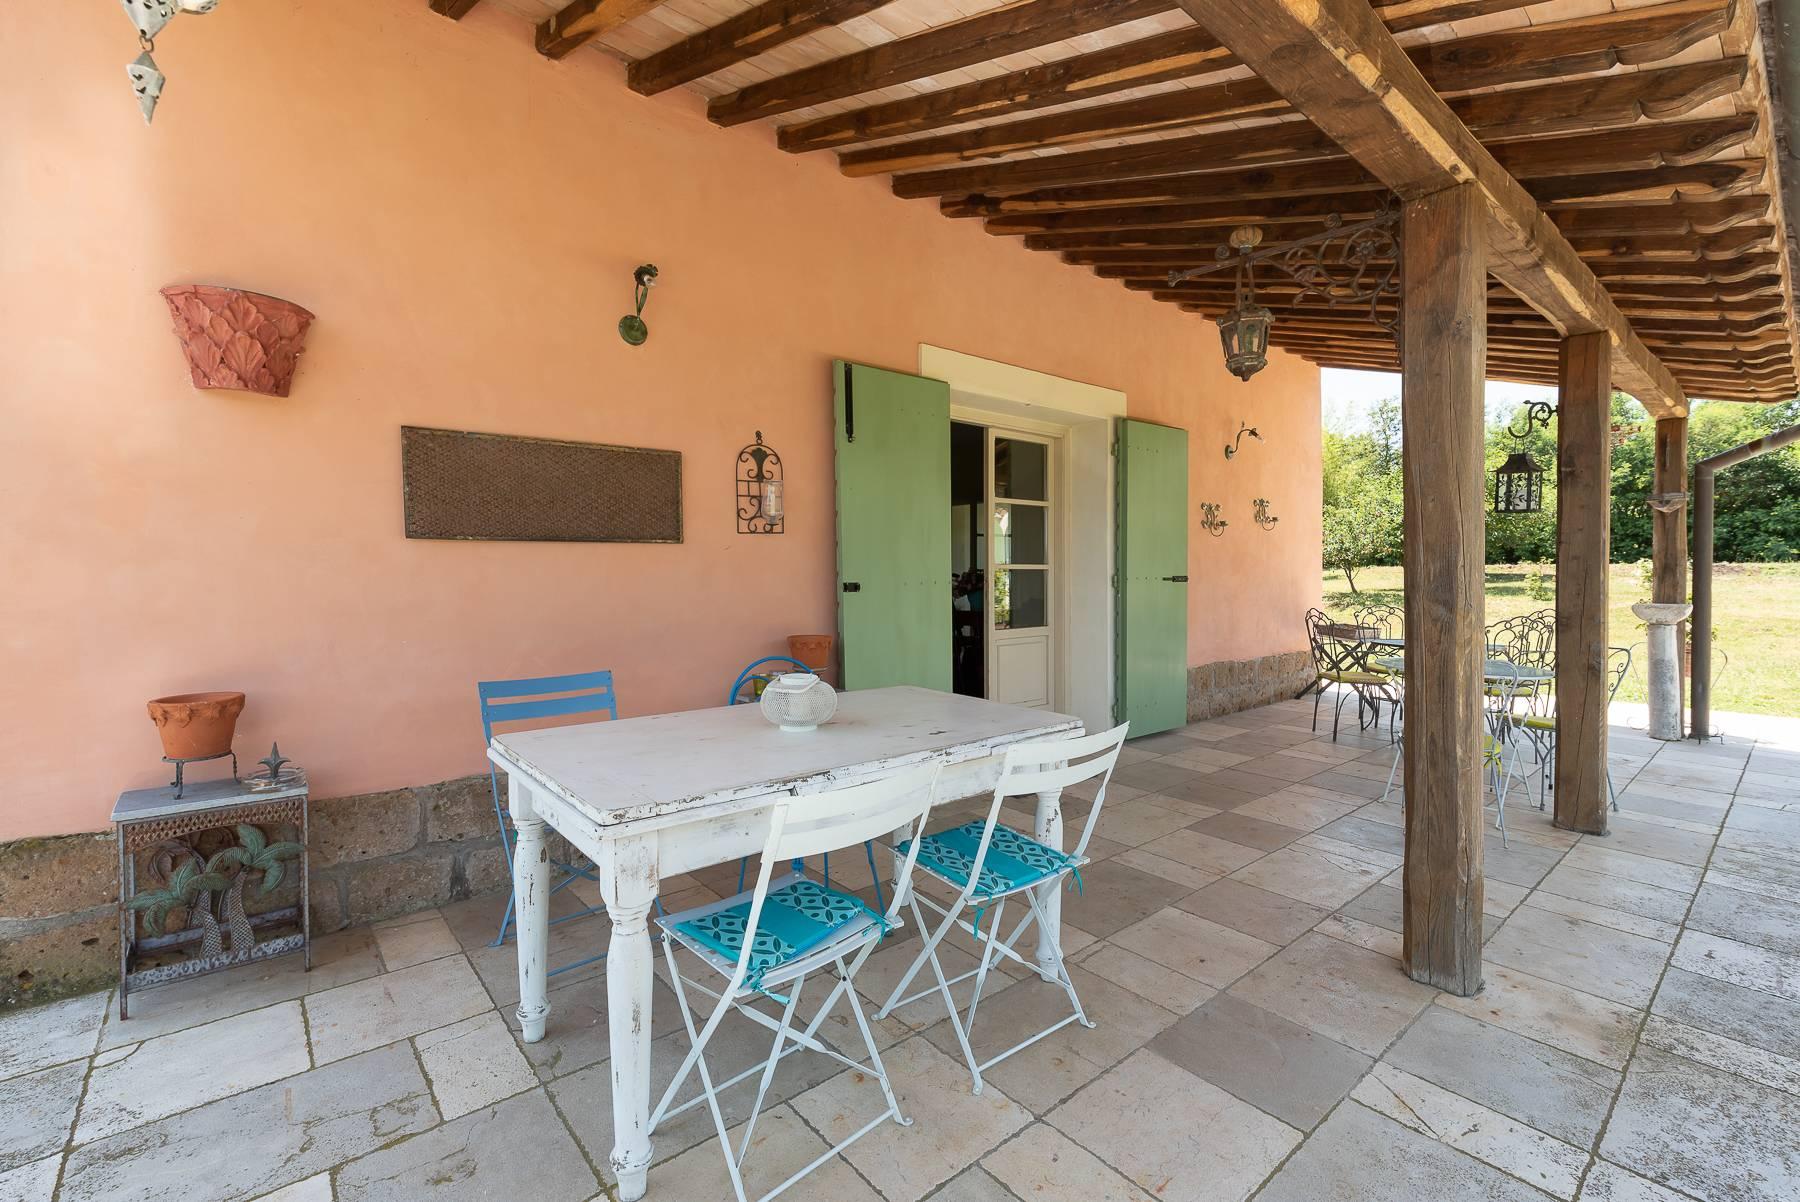 Casa indipendente in Vendita a Sutri: 5 locali, 170 mq